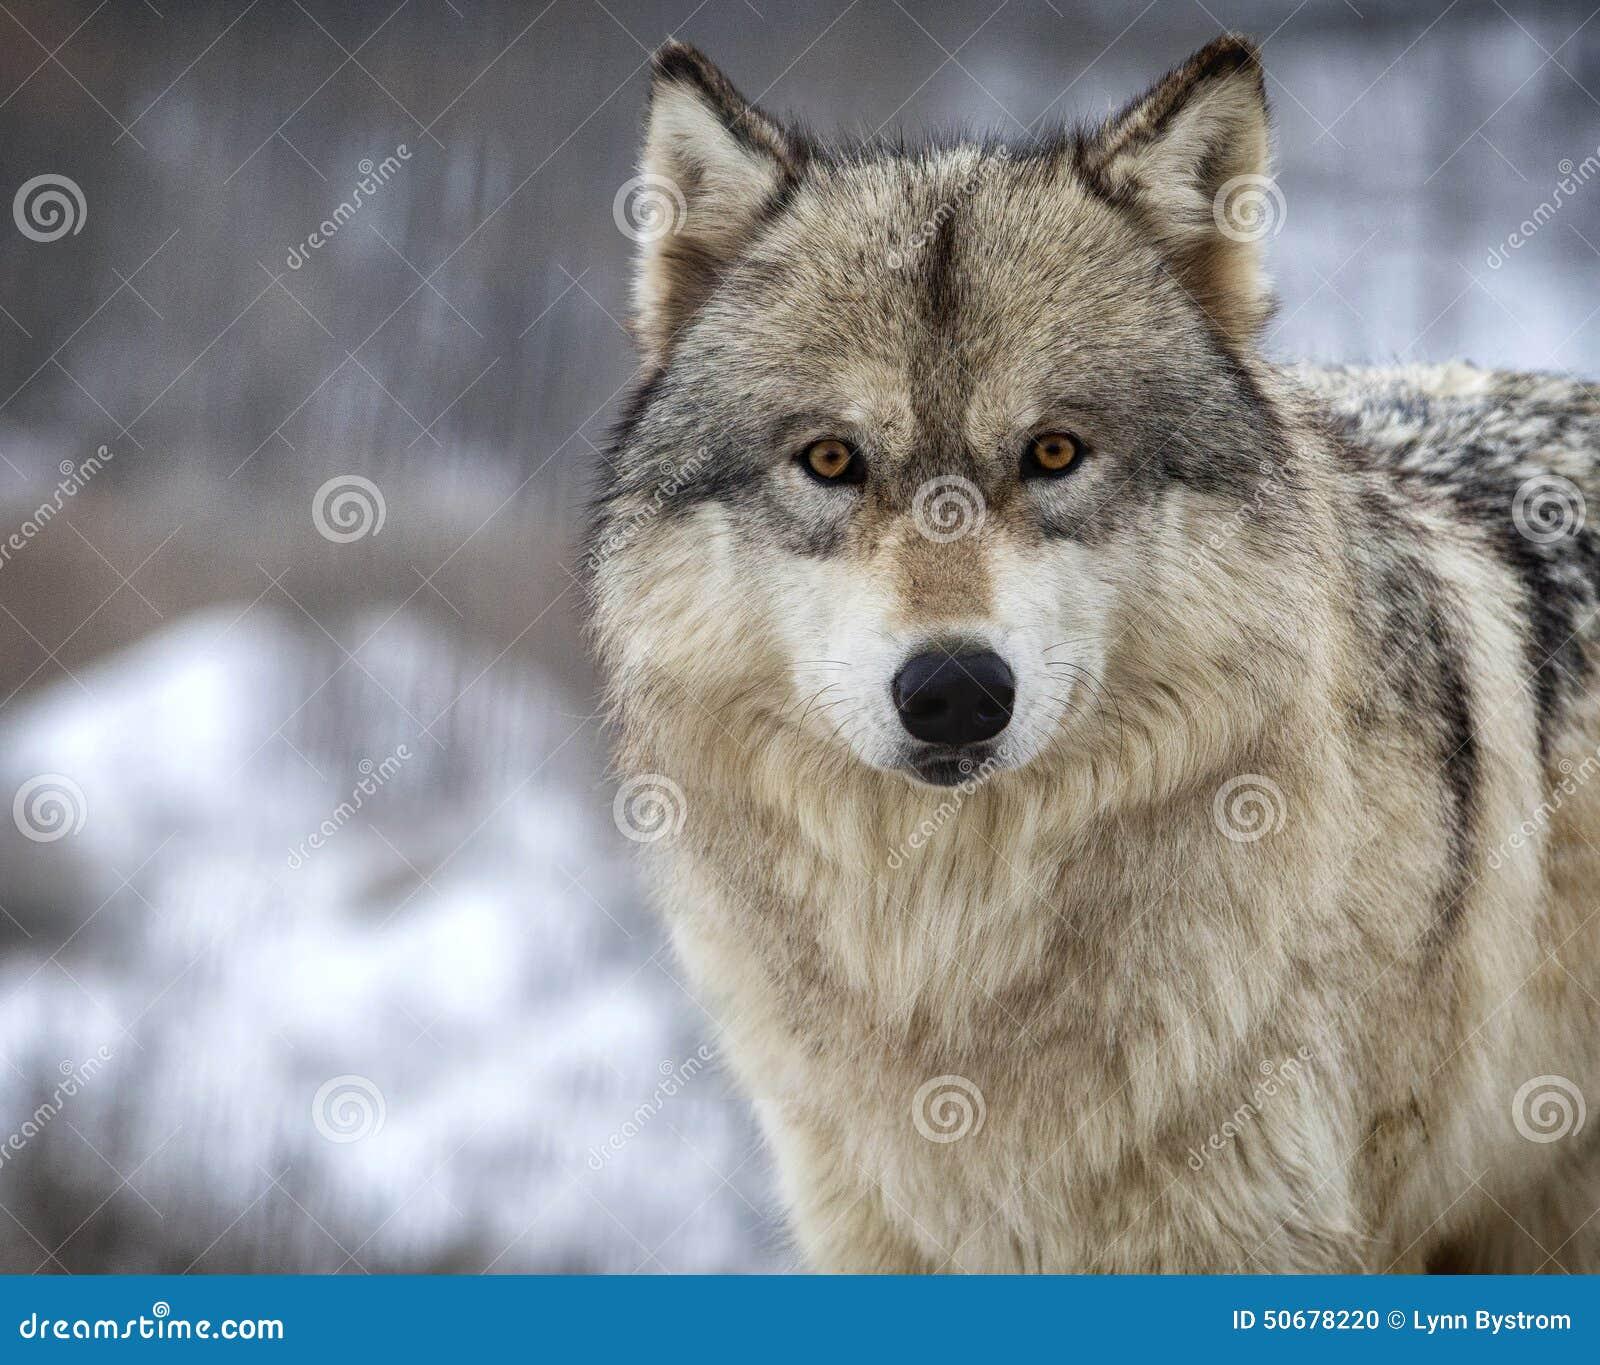 Download 狼 库存照片. 图片 包括有 眼睛, 灰色, 外面, 种类, 茴香, 深度, 明尼苏达, 中西部, 野生生物 - 50678220